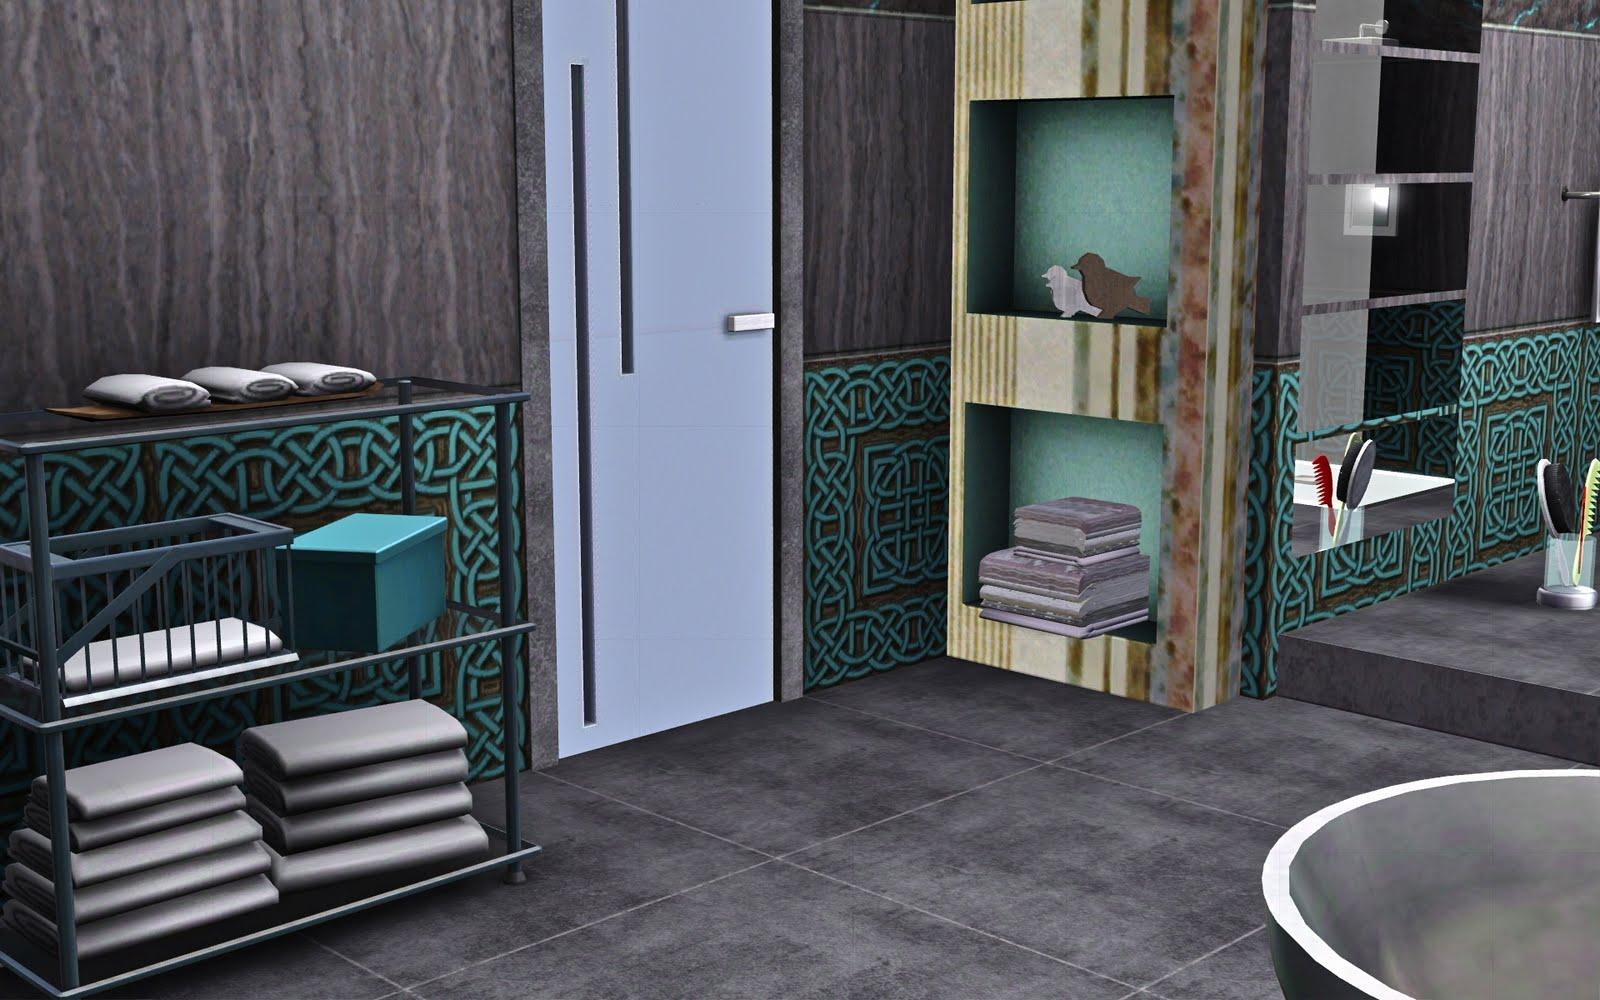 le blog de guijobo ambiance salle de bain oniris. Black Bedroom Furniture Sets. Home Design Ideas